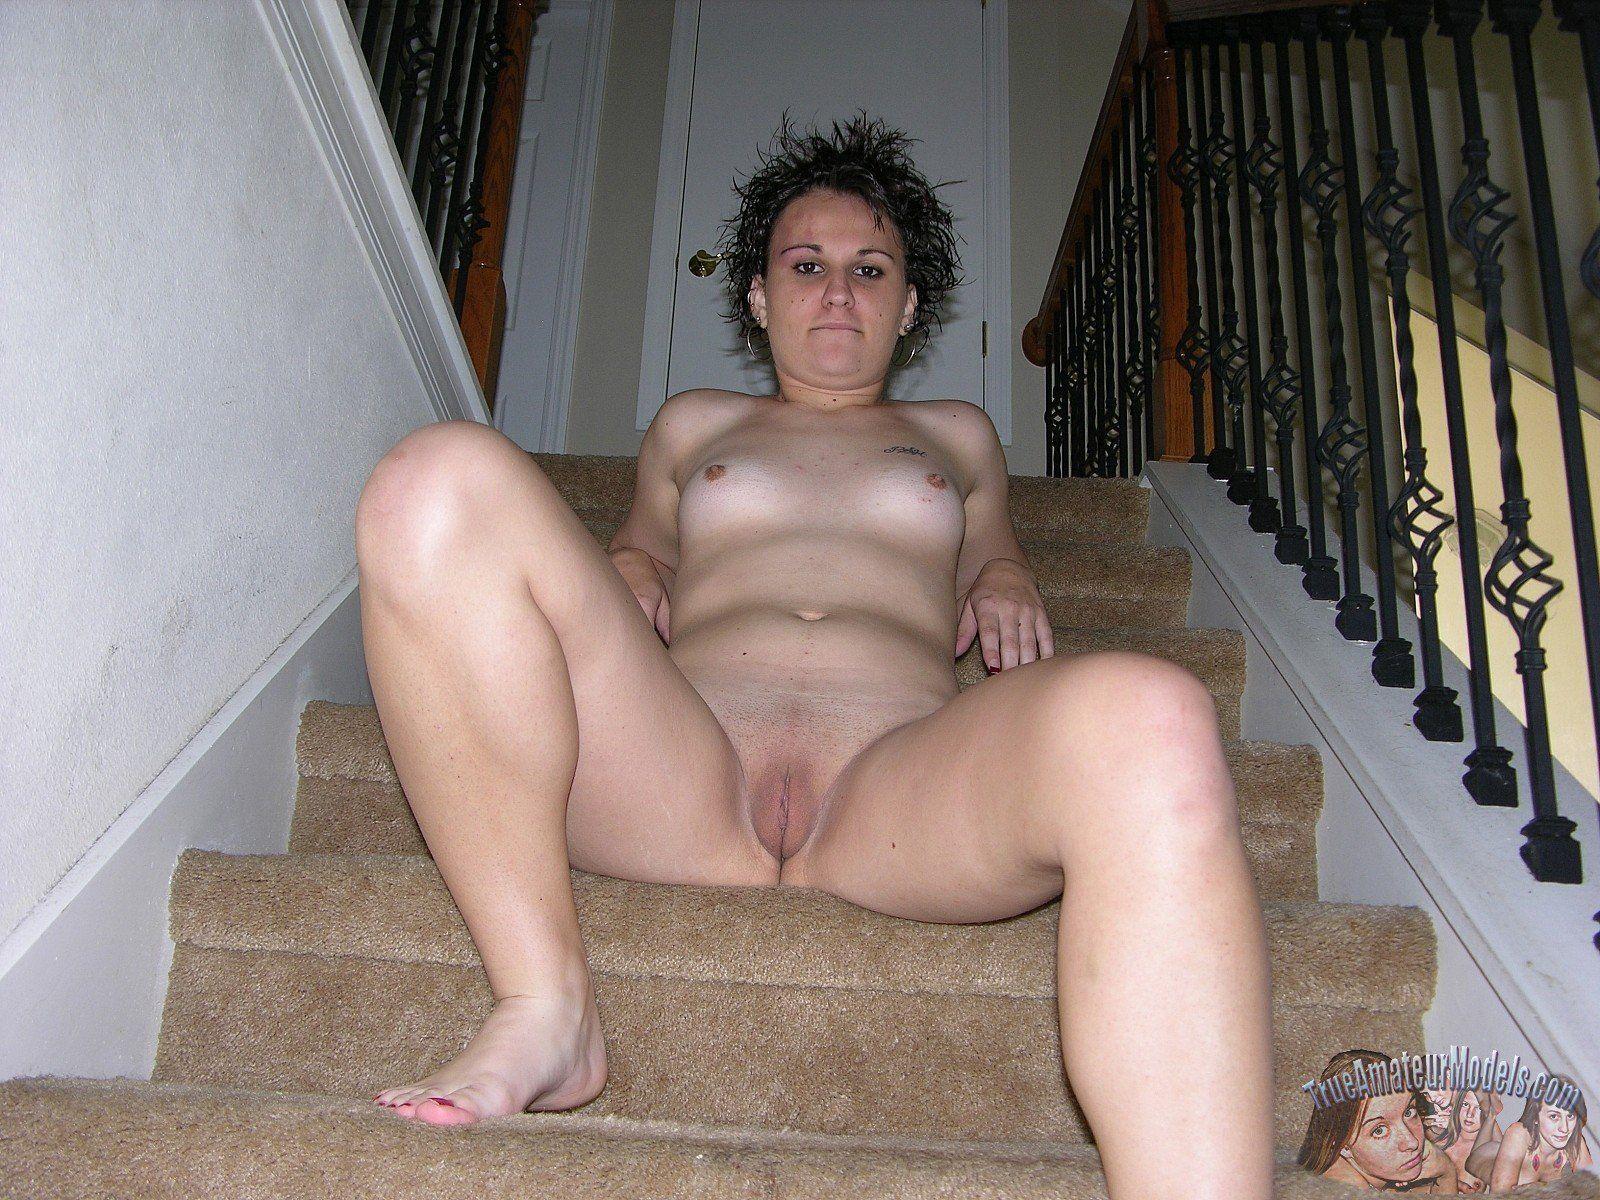 Short hair amateur mature milf porn